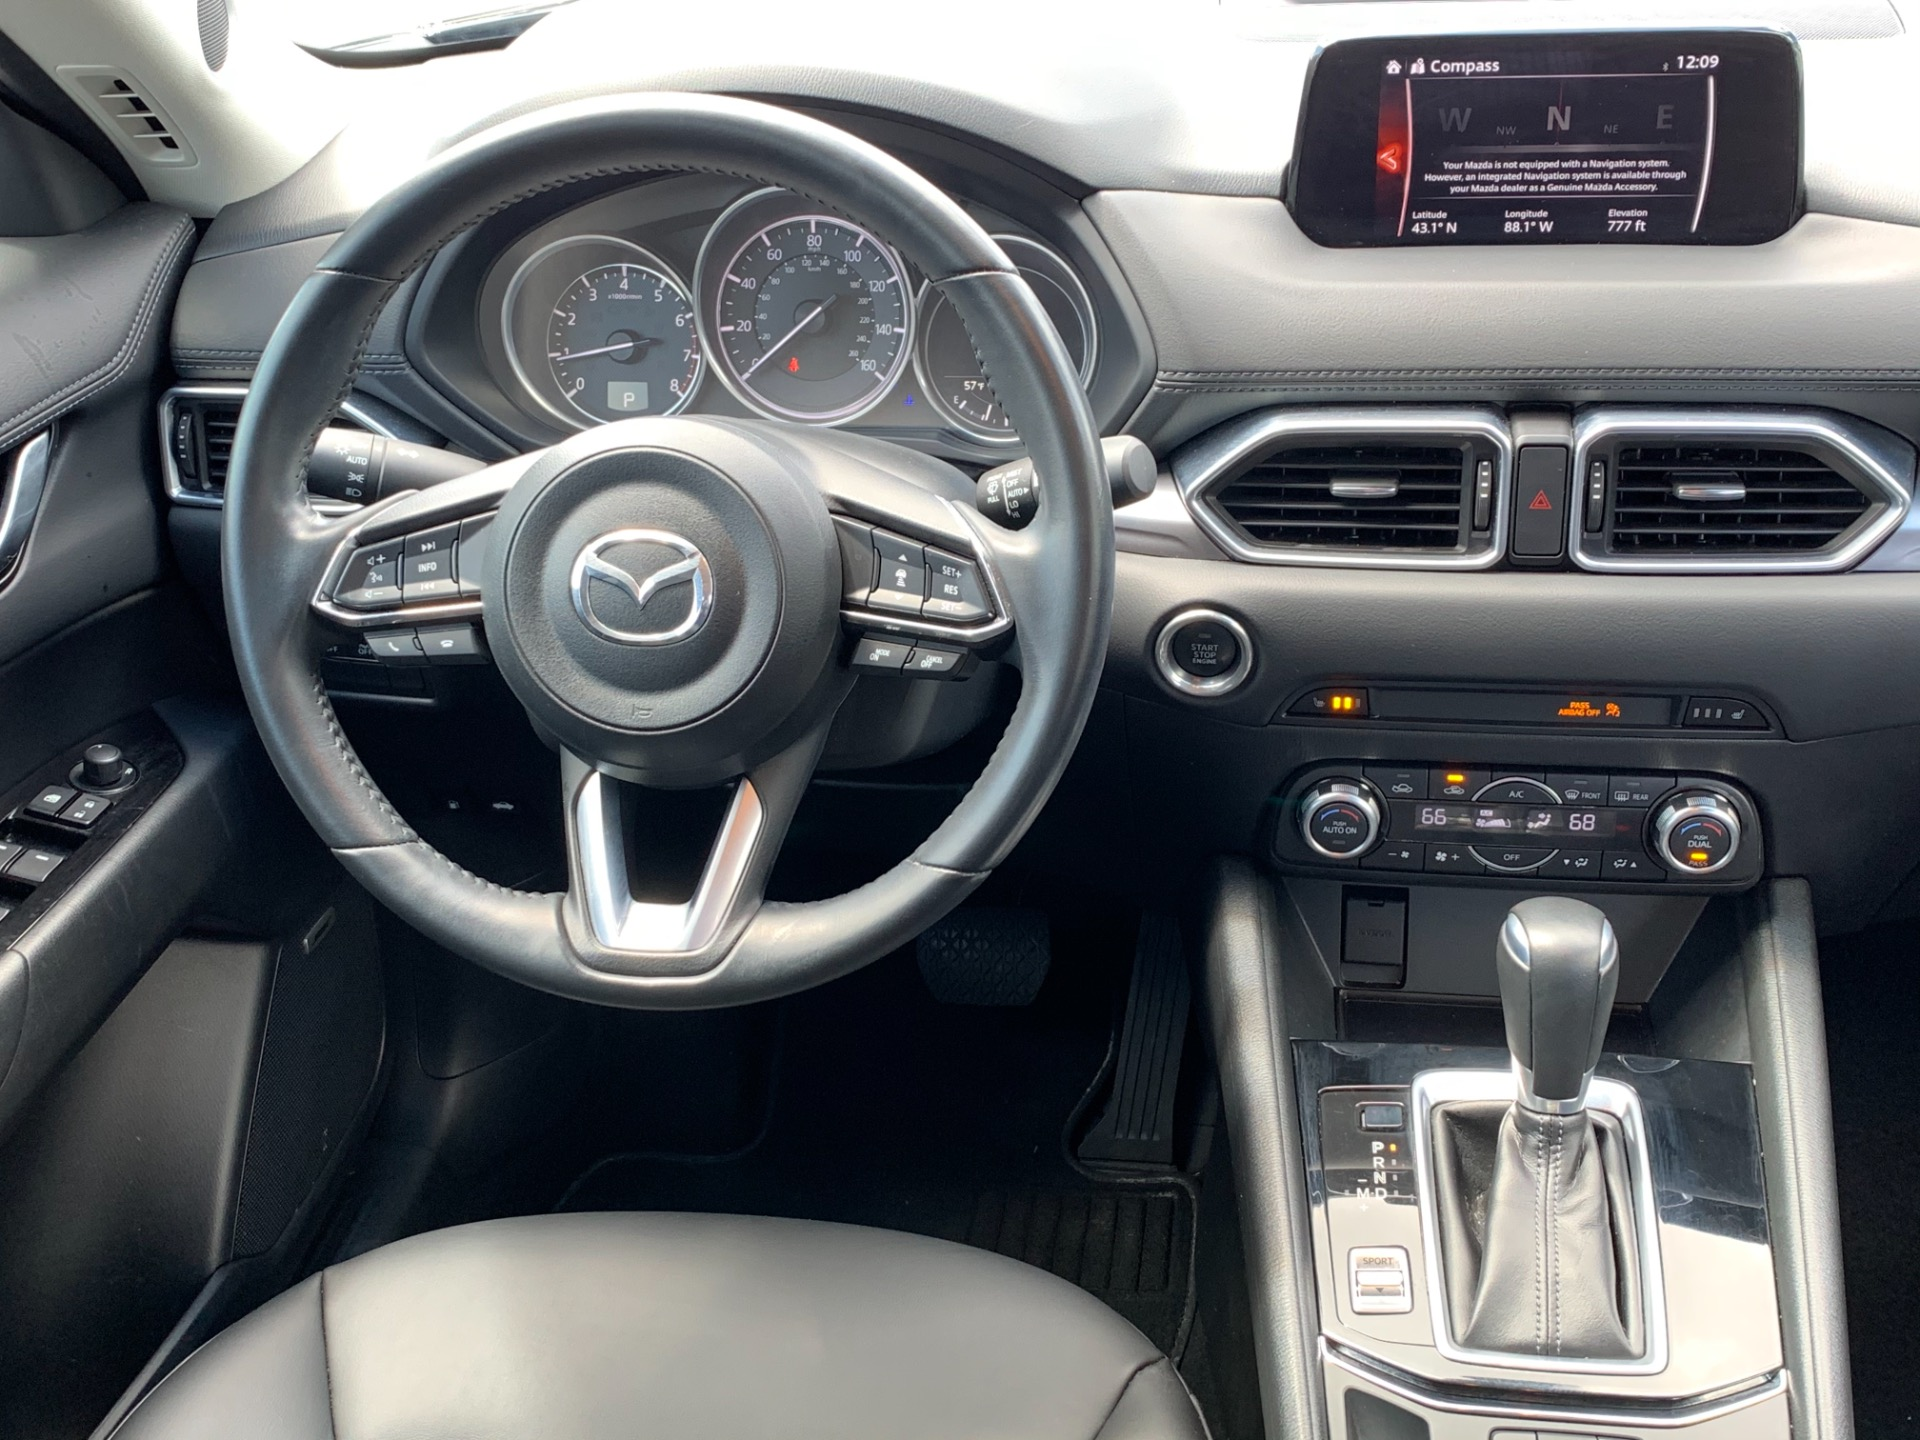 Used-2018-Mazda-CX-5-Touring-AWD-W/Adaptive-Cruise